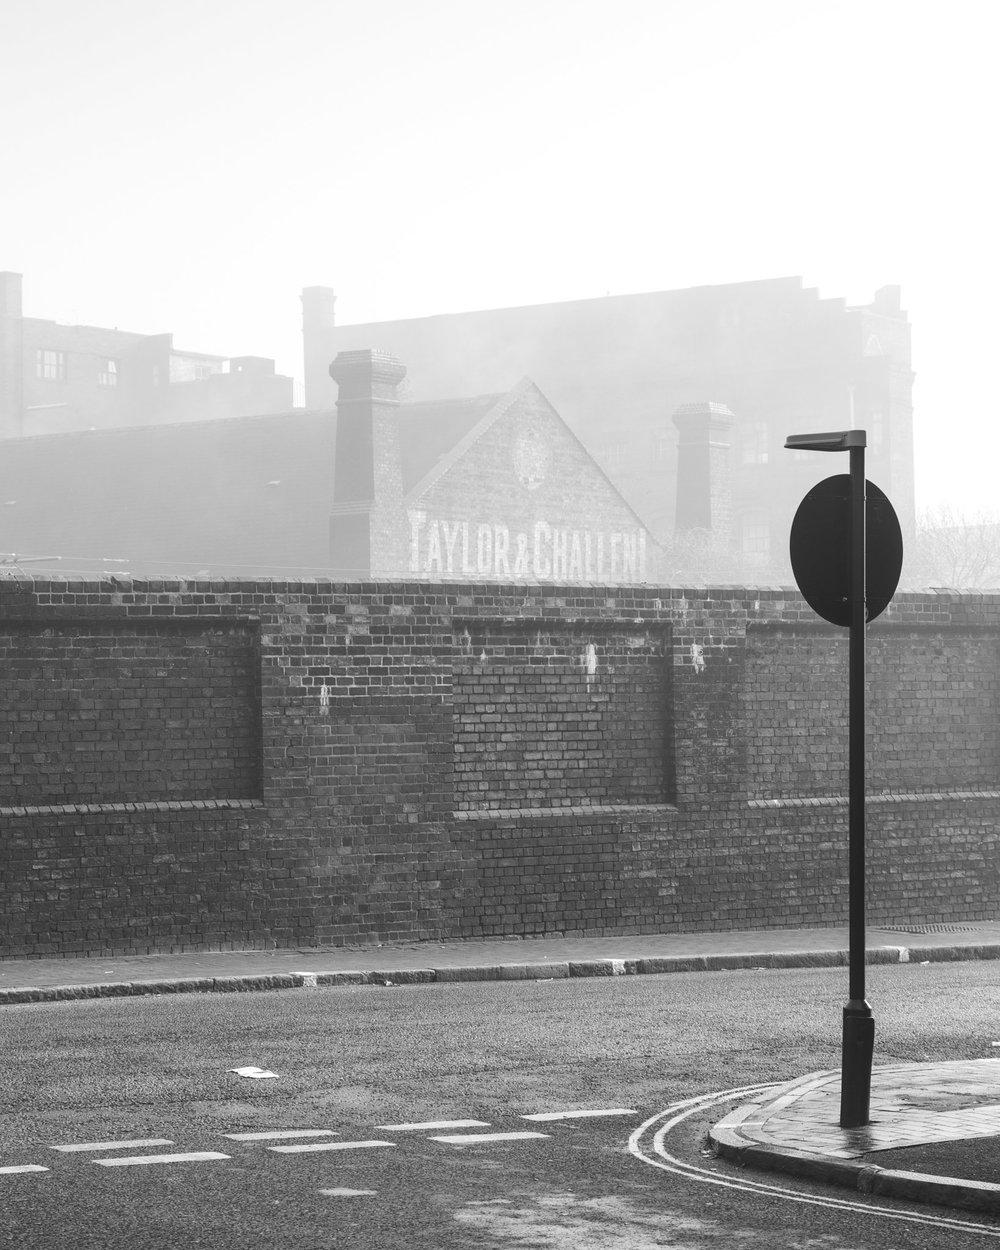 Ross Jukes Photography Birmingham - www.rossjukesphoto.co.uk